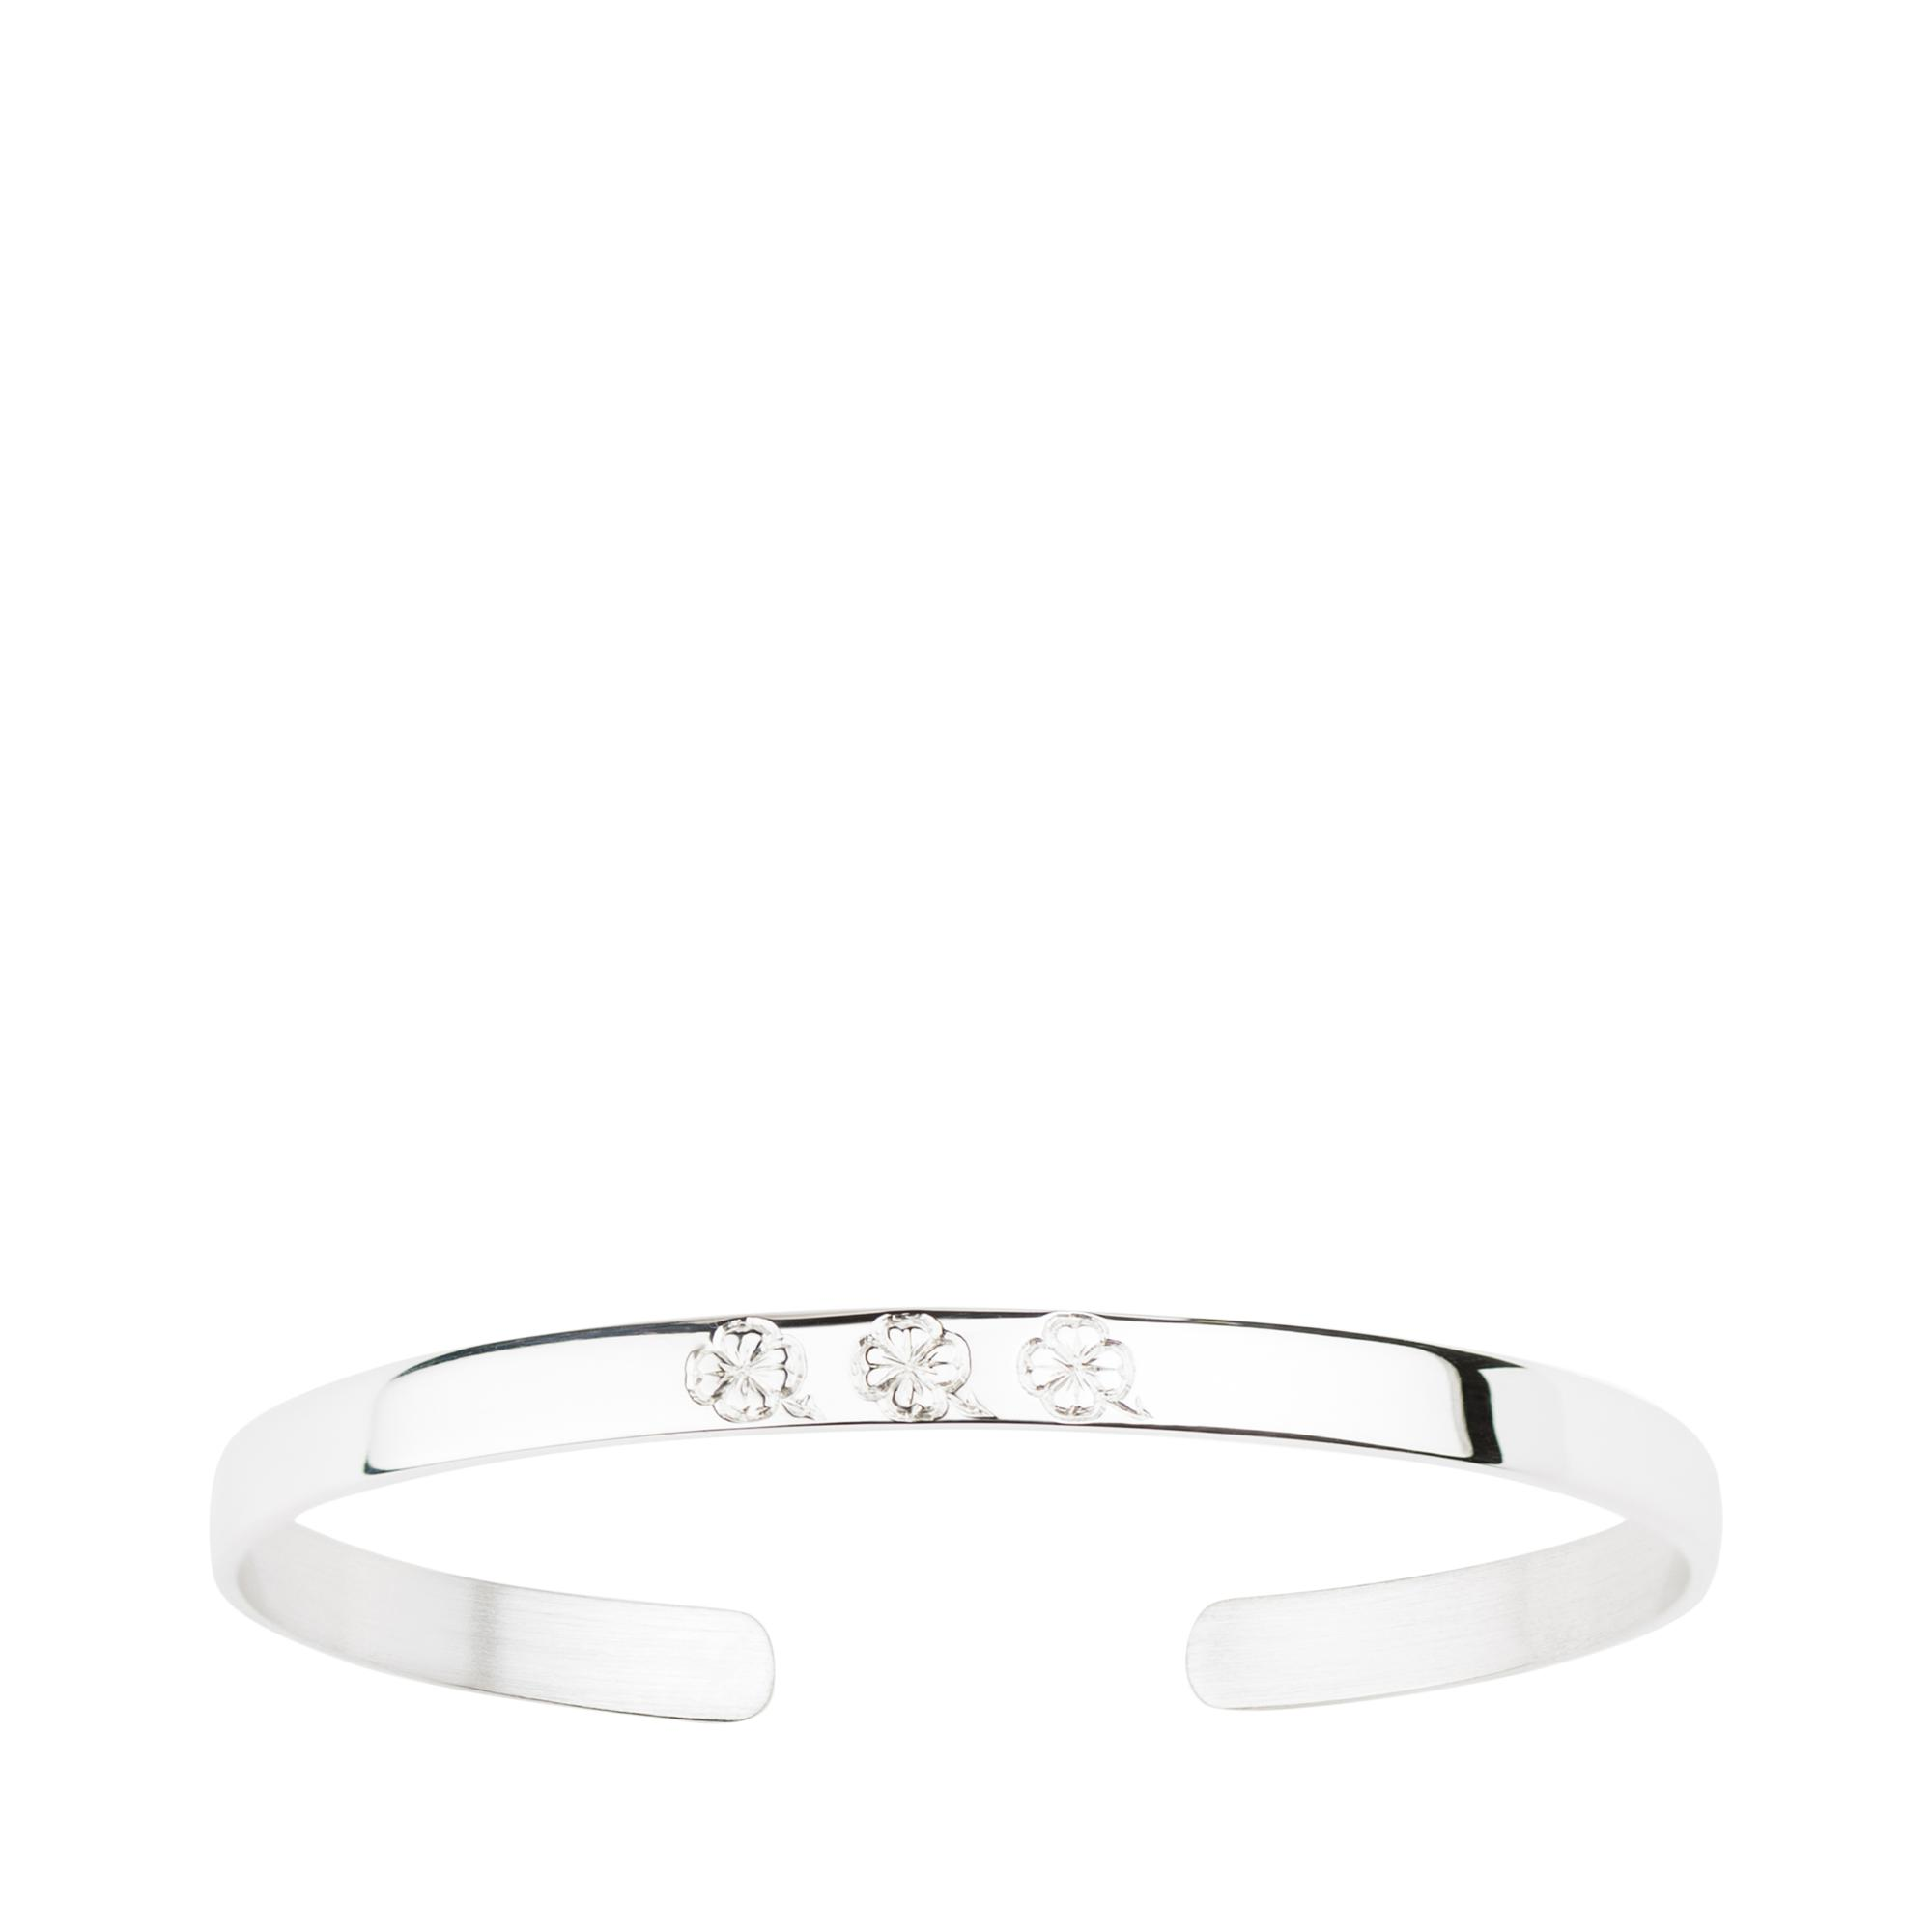 Aurélie Bidermann Fine jewellery - Engraved bracelet LpNkd